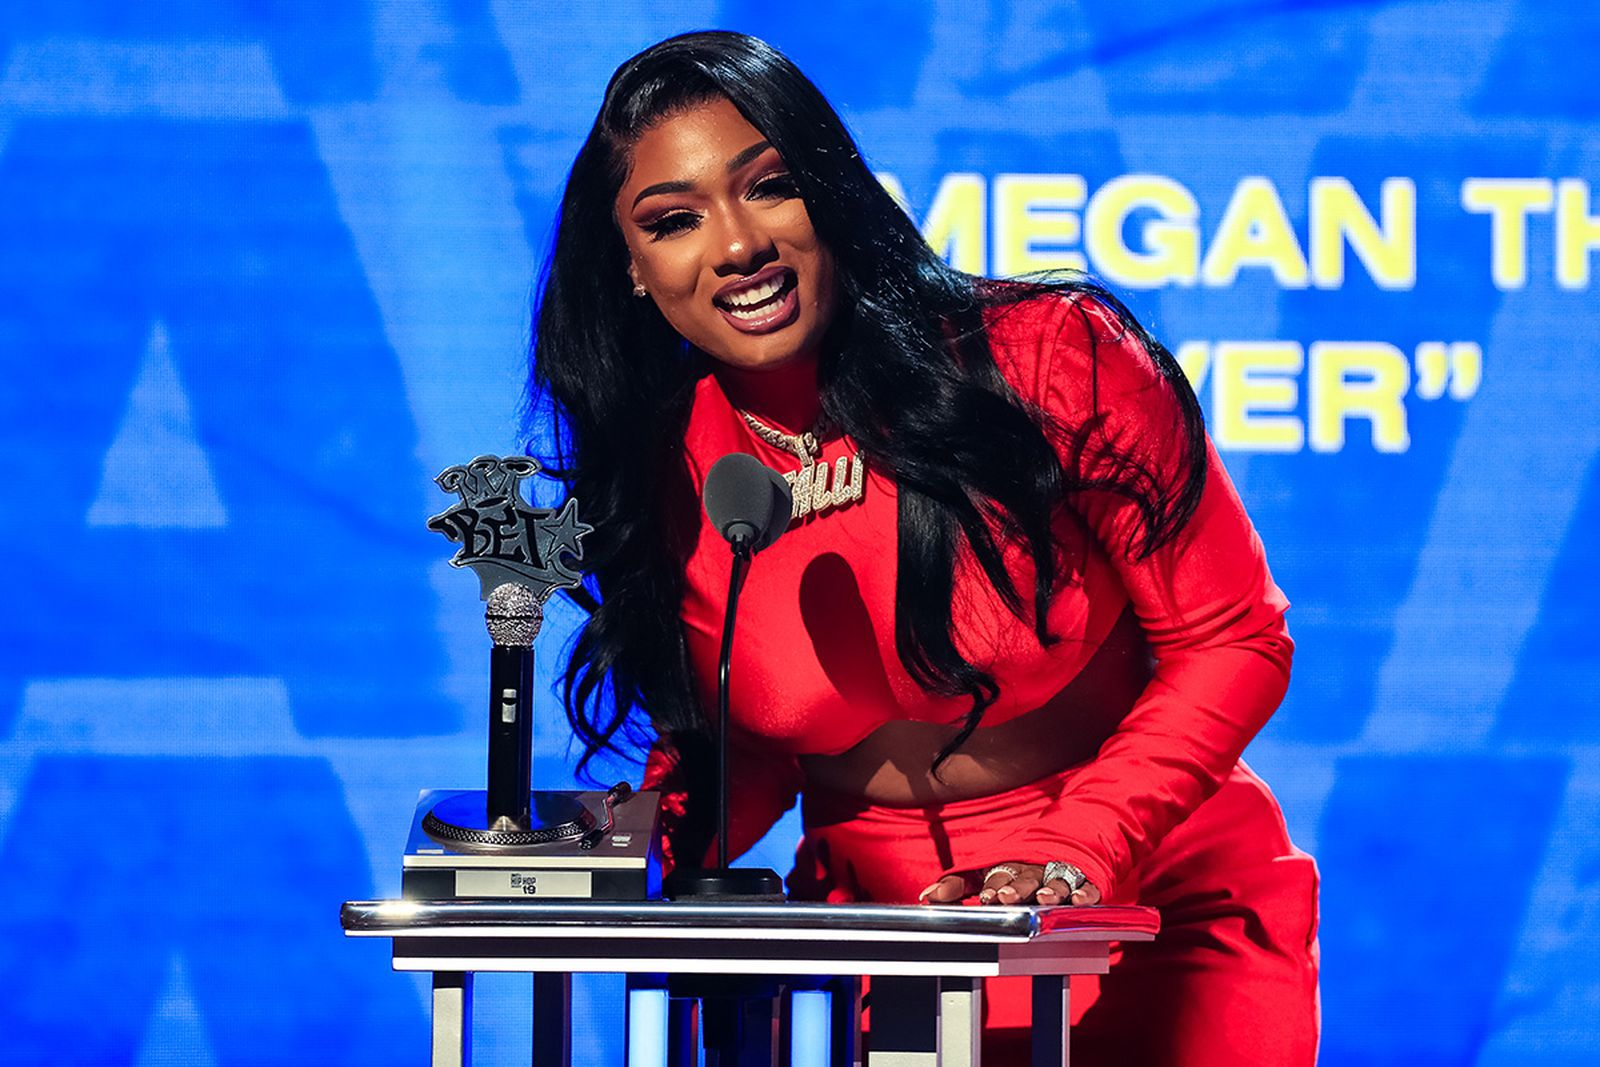 megan thee stallion bet hip hop awards speech